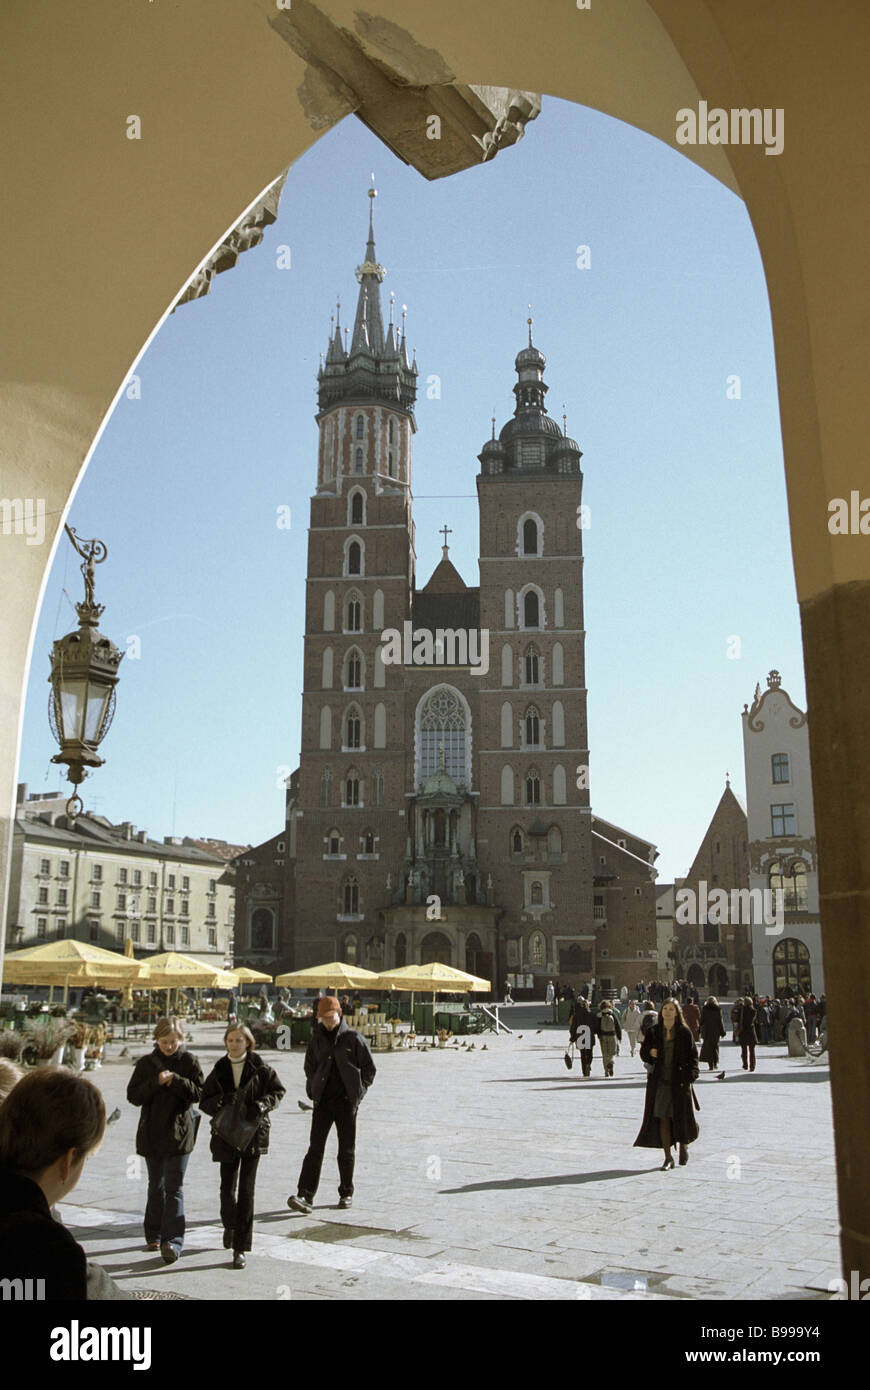 St Mary s Church Kosciol Mariacki in the Central Market square - Stock Image